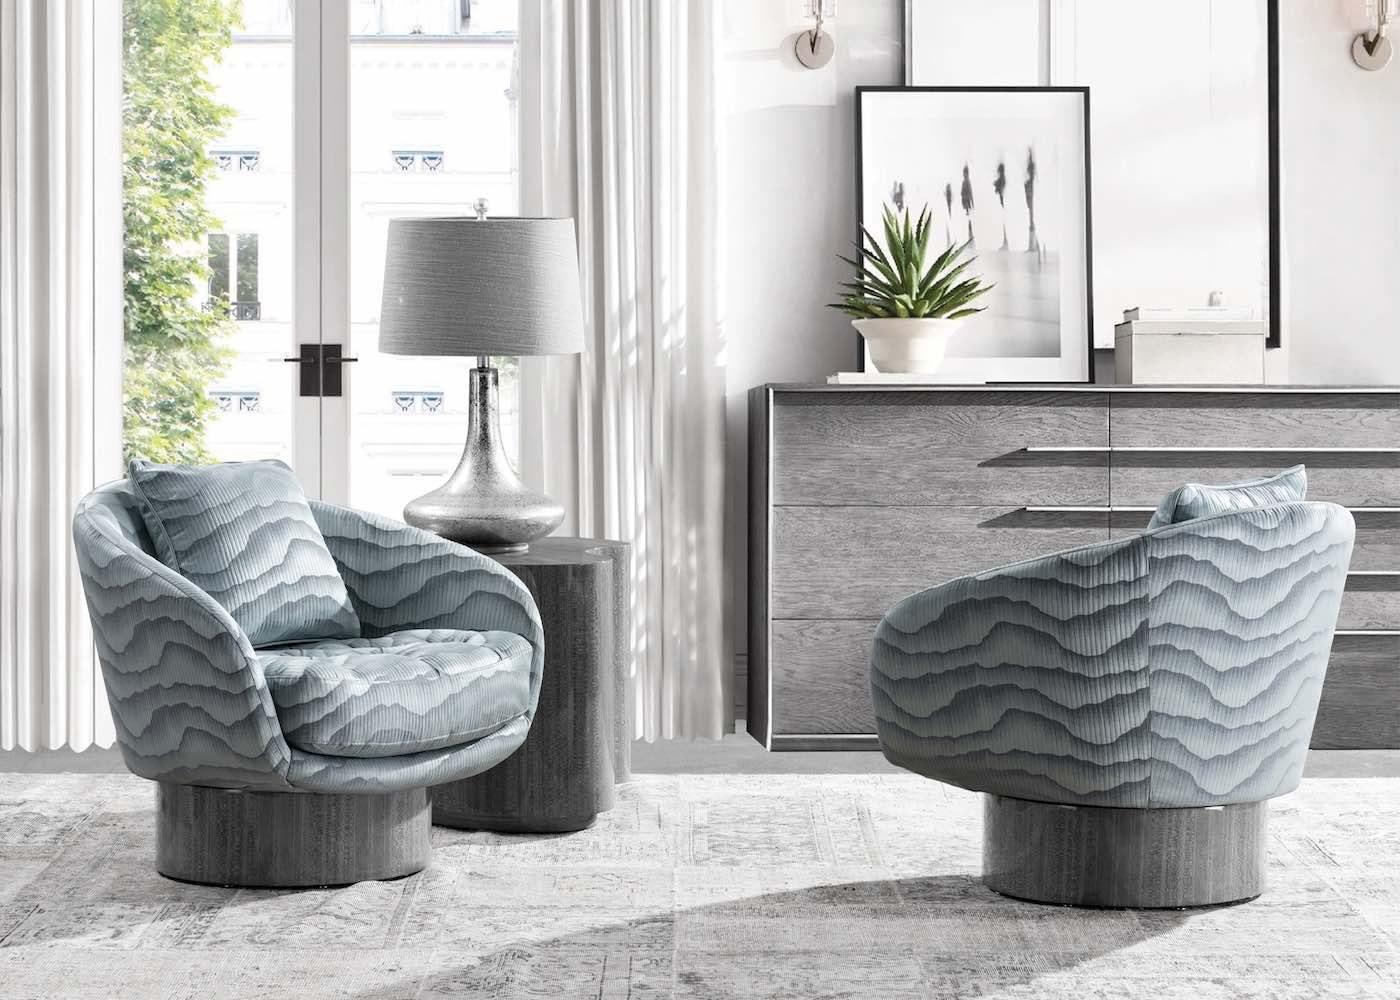 mazarin-ameublement-catalogue-produits-chaise-fauteuil-15